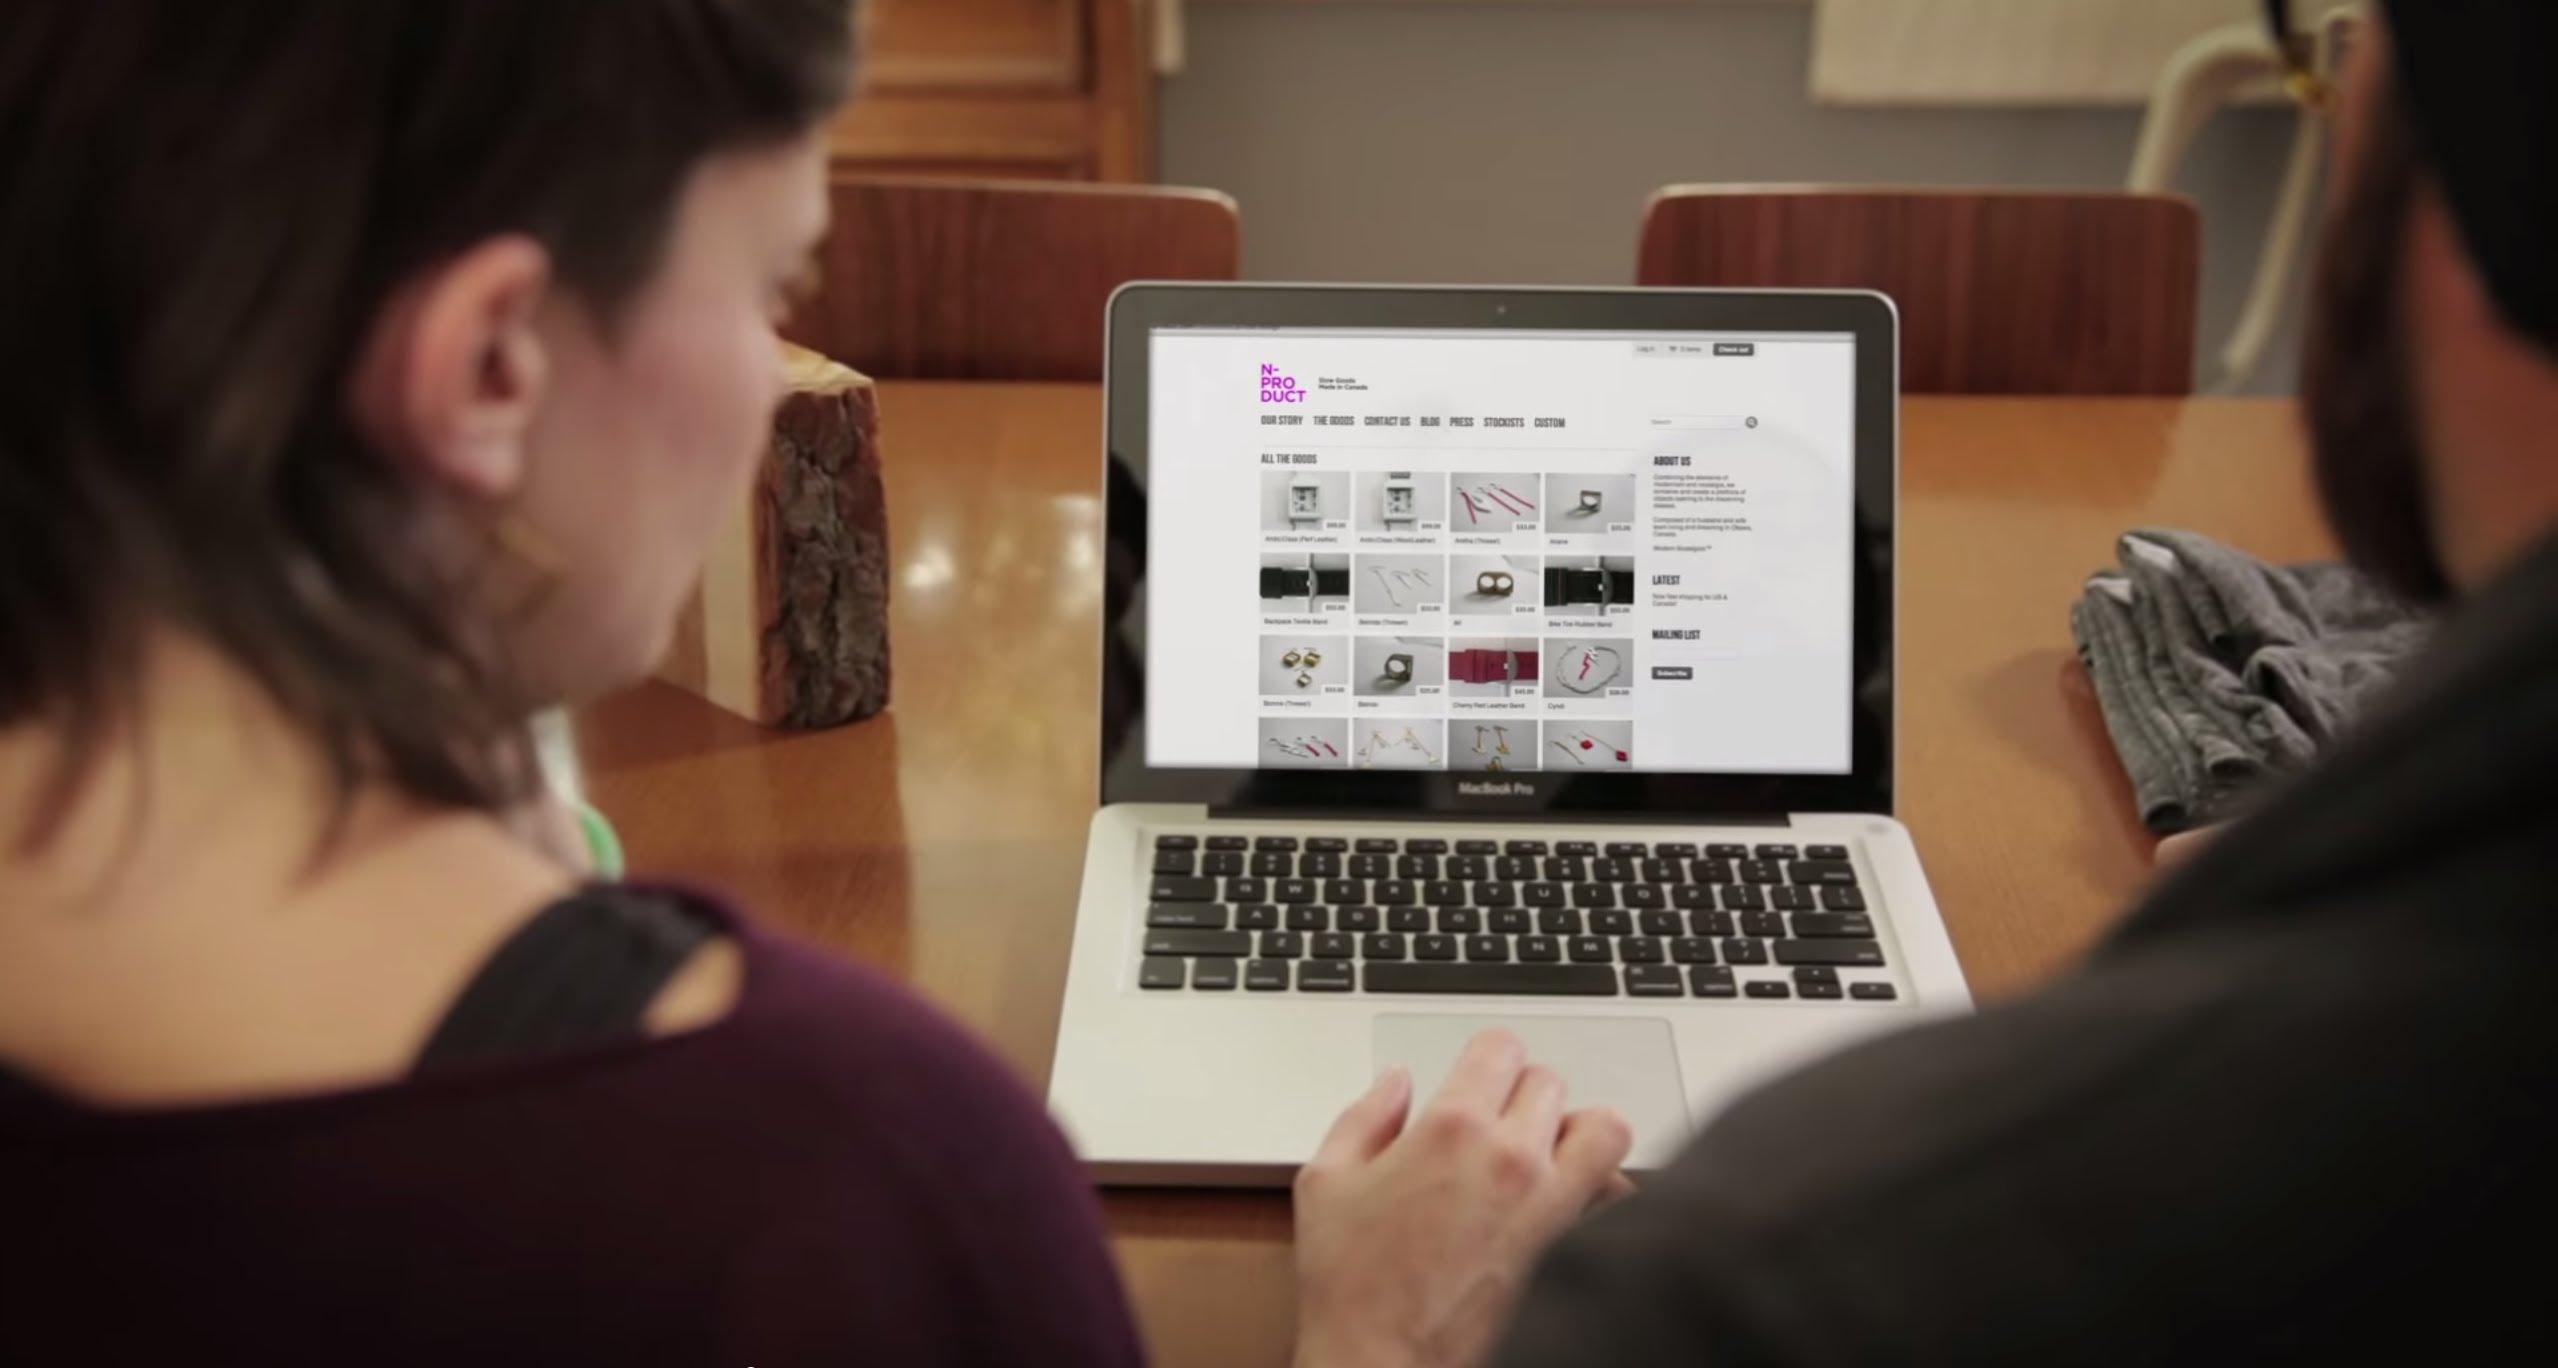 Shopify Shopify是什么? 跨境电商自建站Shopify怎么样?